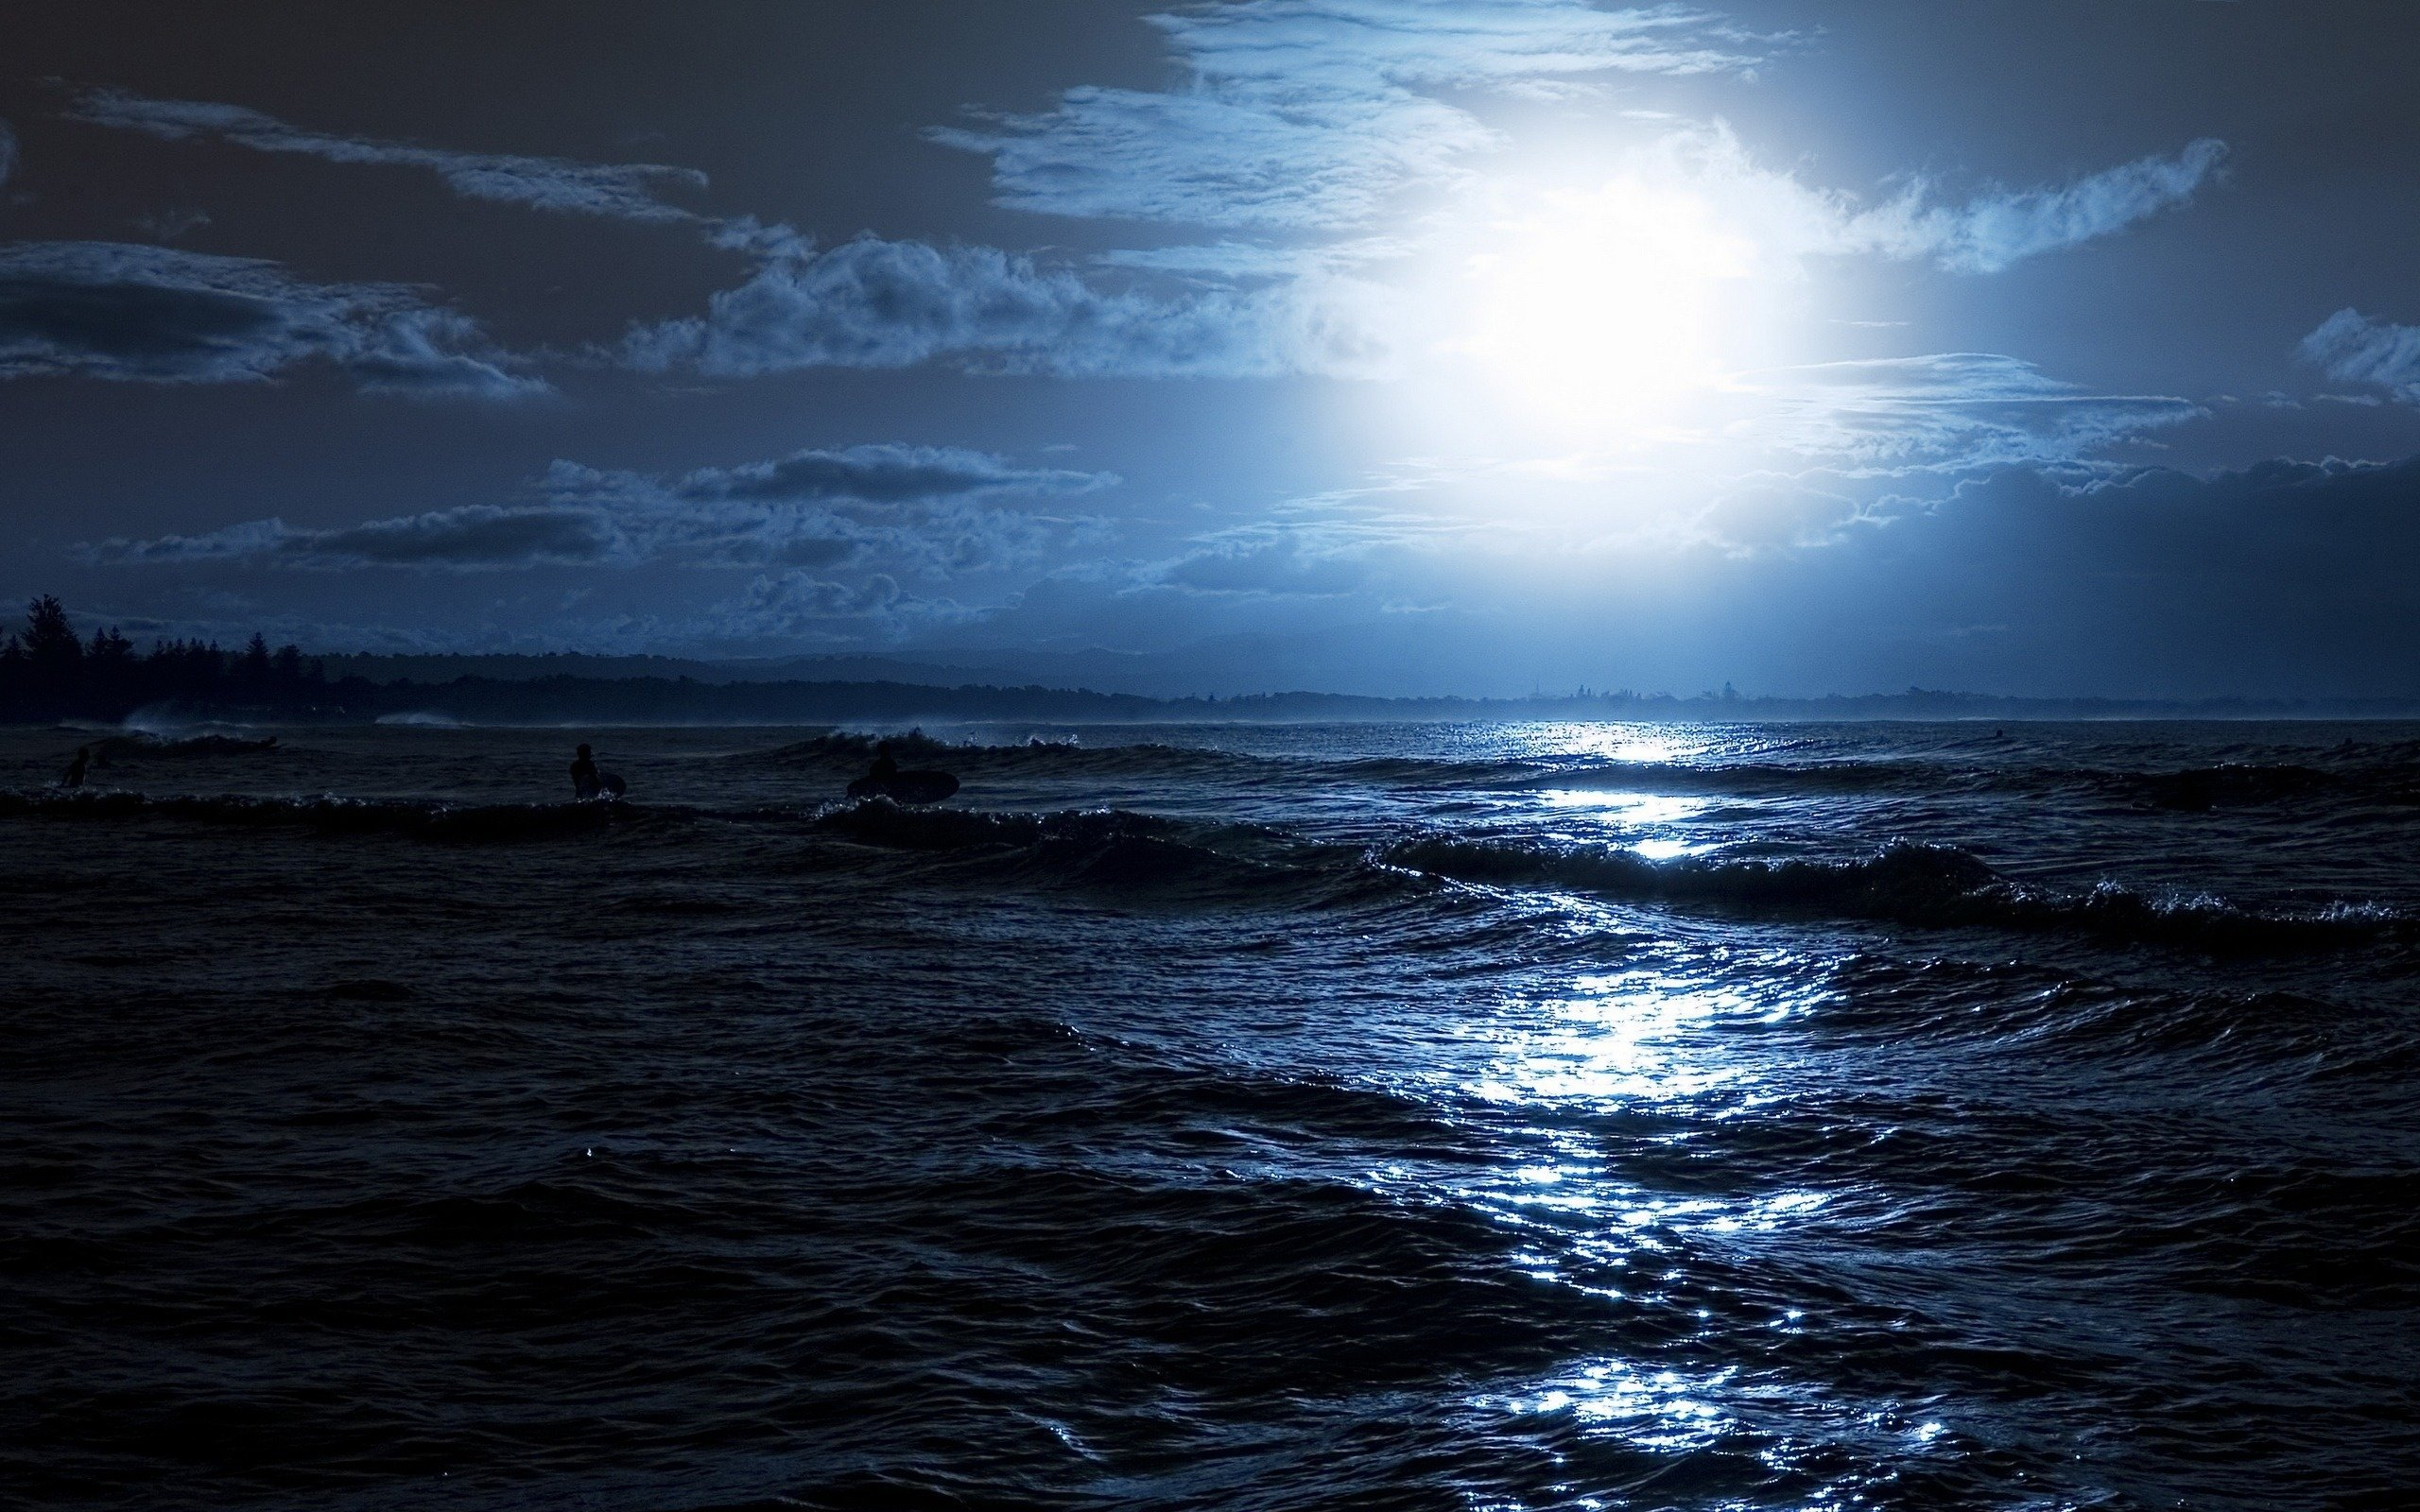 Wallpaper moon sea night clouds wave desktop wallpaper Nature 2560x1600